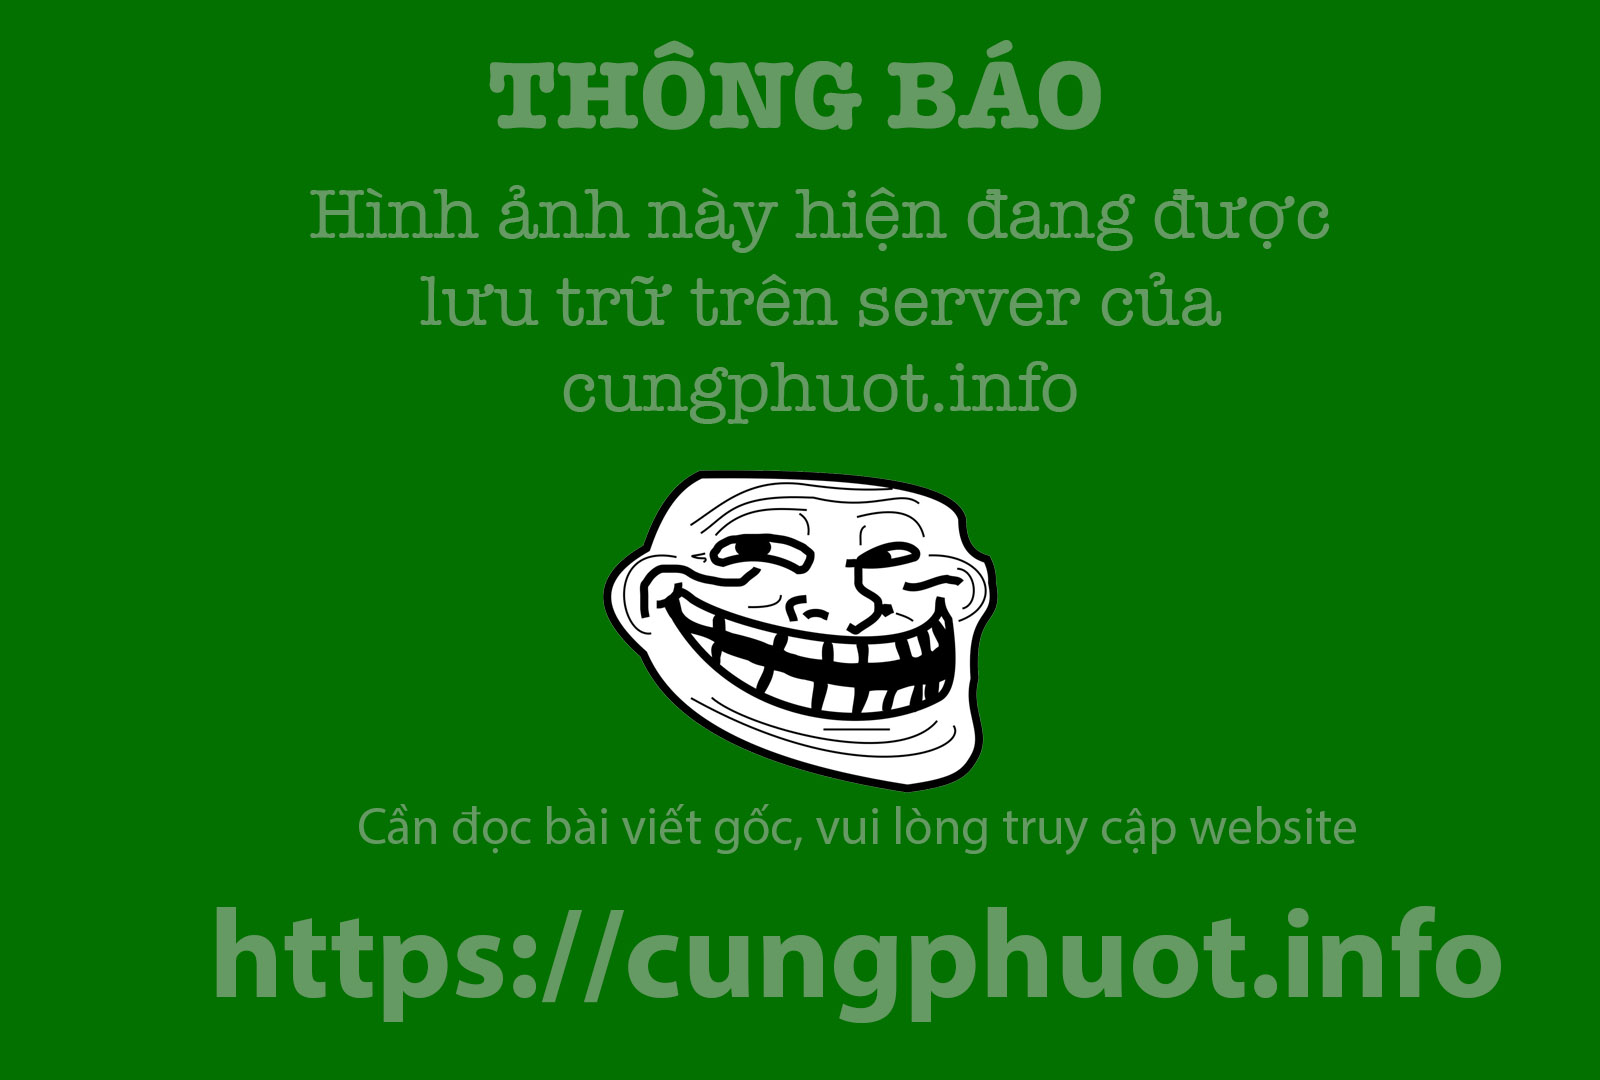 Dem hoi den long Trung thu lon nhat ca nuoc hinh anh 2